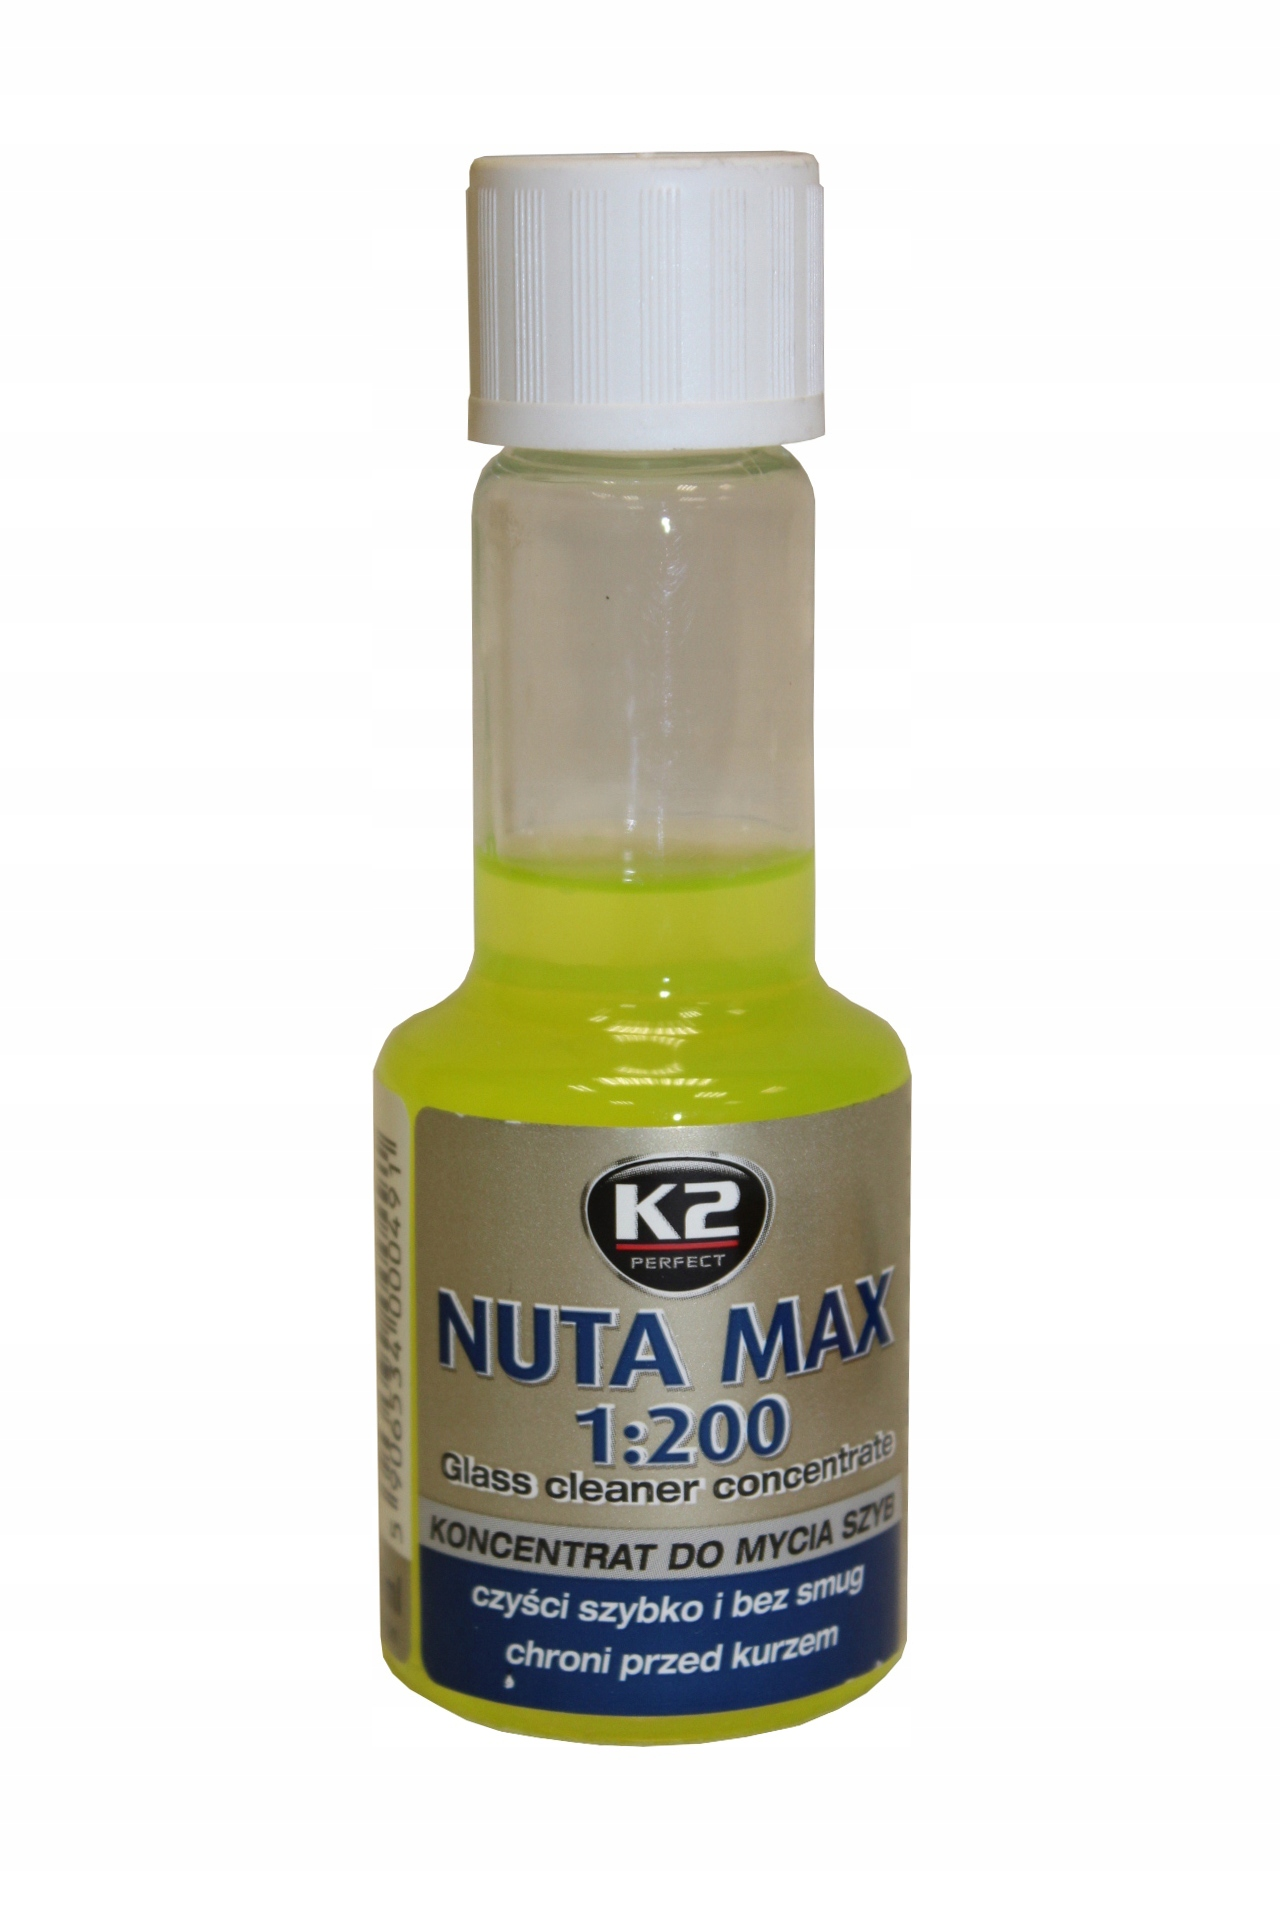 K2 НОТА MAX Концентрат для мытья стекол 50 мл